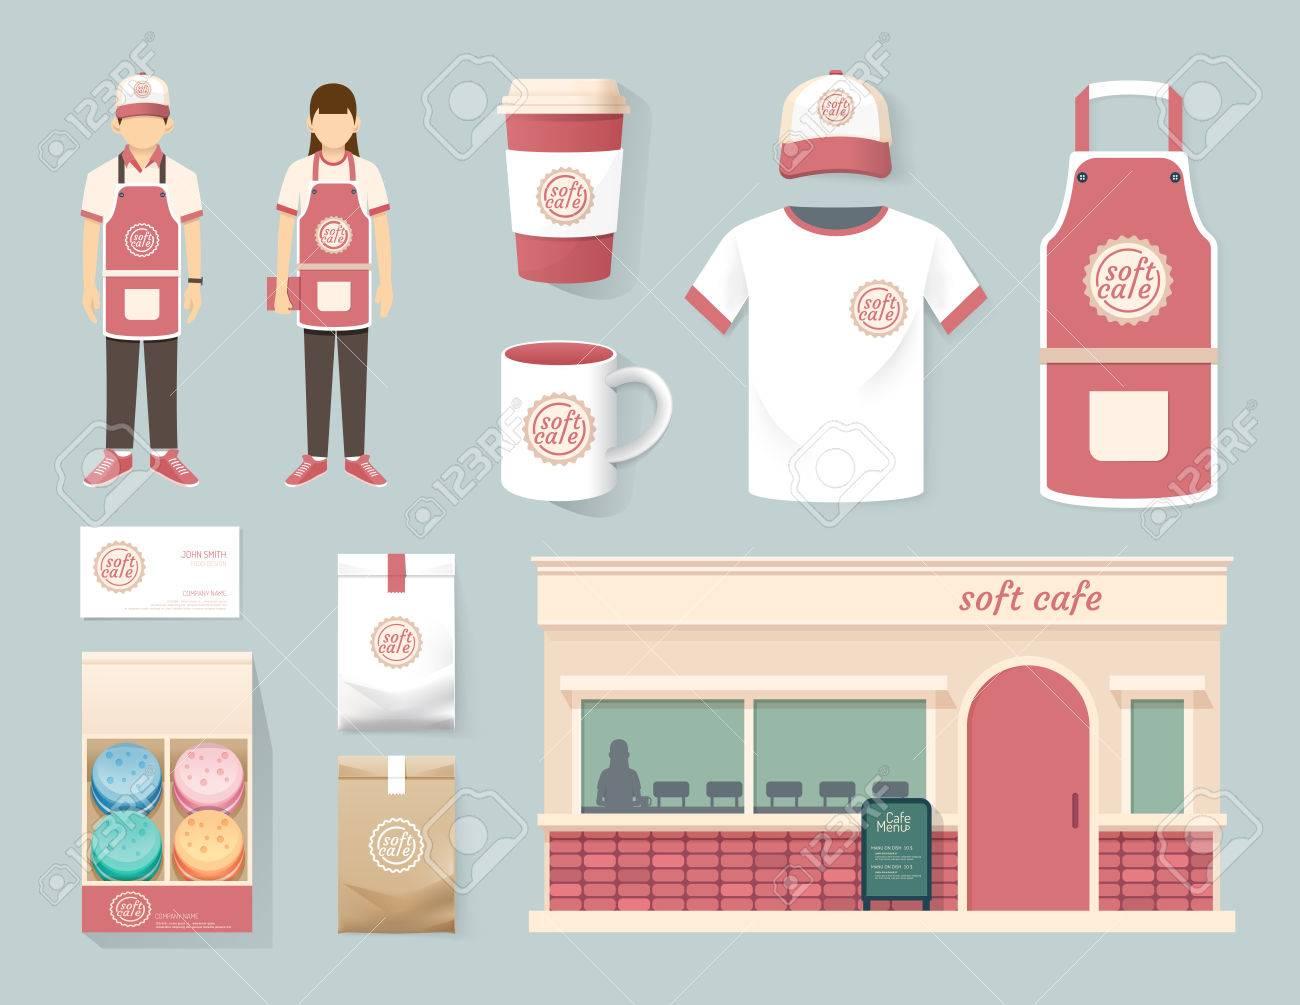 Shirt uniform design vector - Uniform Template Vector Restaurant Cafe Set Shop Front Design Flyer Menu Package